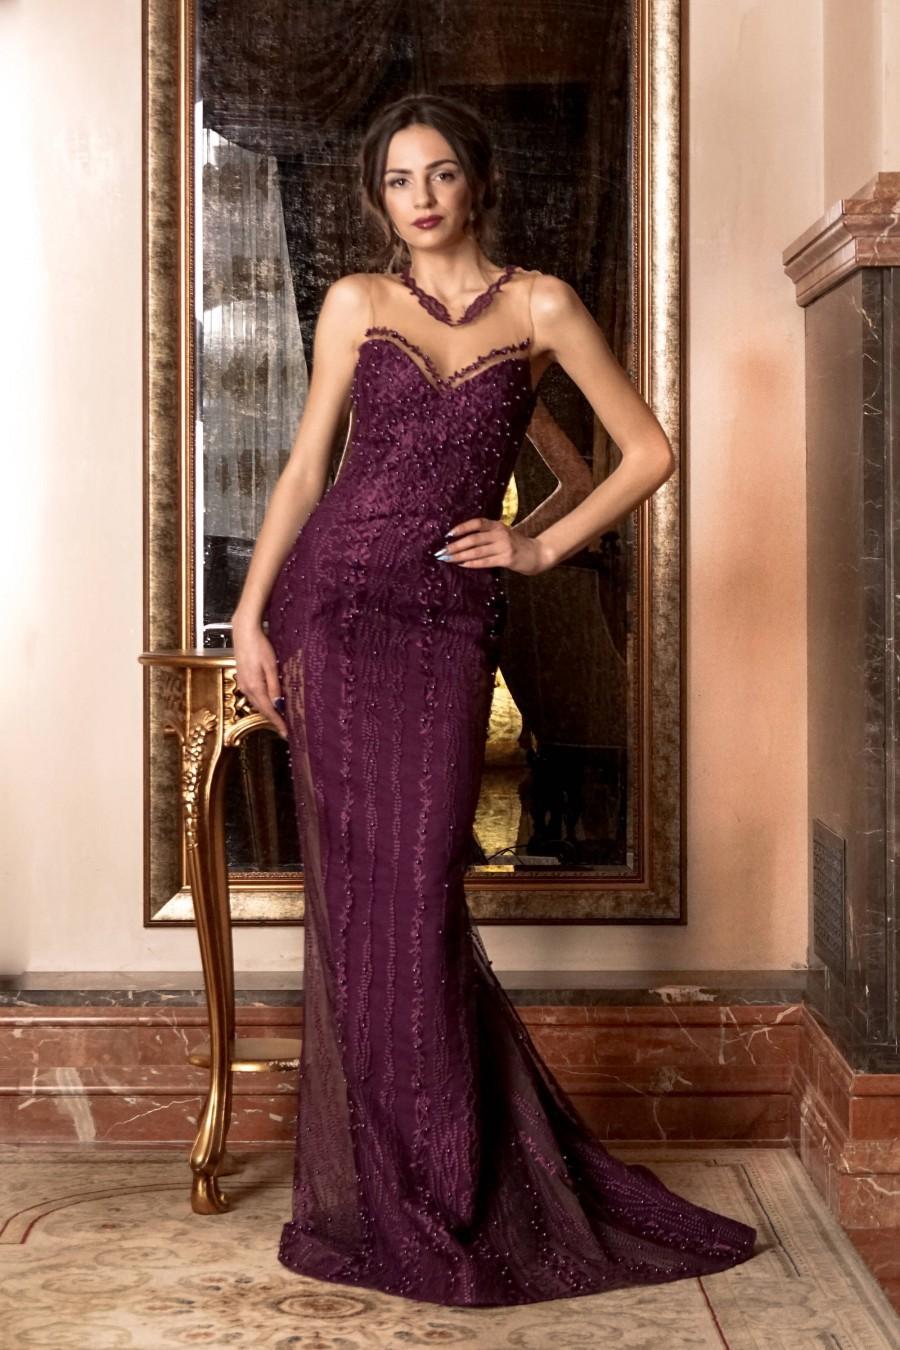 Hochzeit - Sleeveless beaded prom dress, purple sheath cocktail dress backless tulle long train elegant dress couture evening romantic formal dress